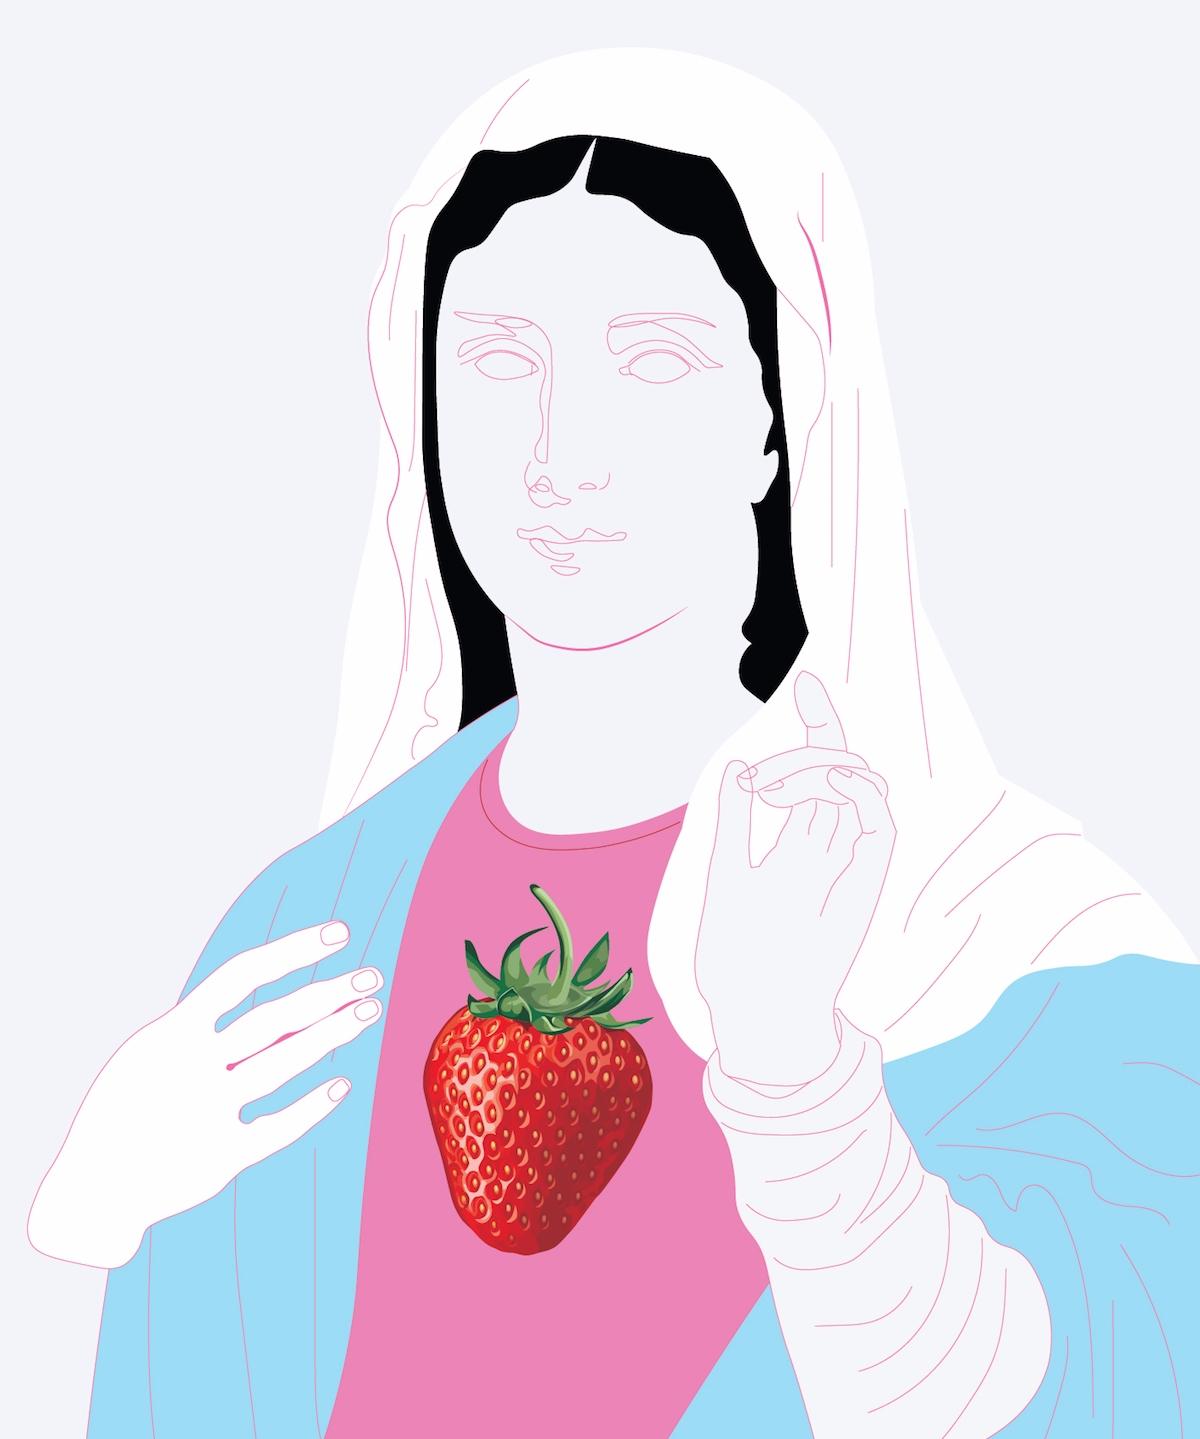 Strawberry feels N2 2d doodle s - sandromartini   ello